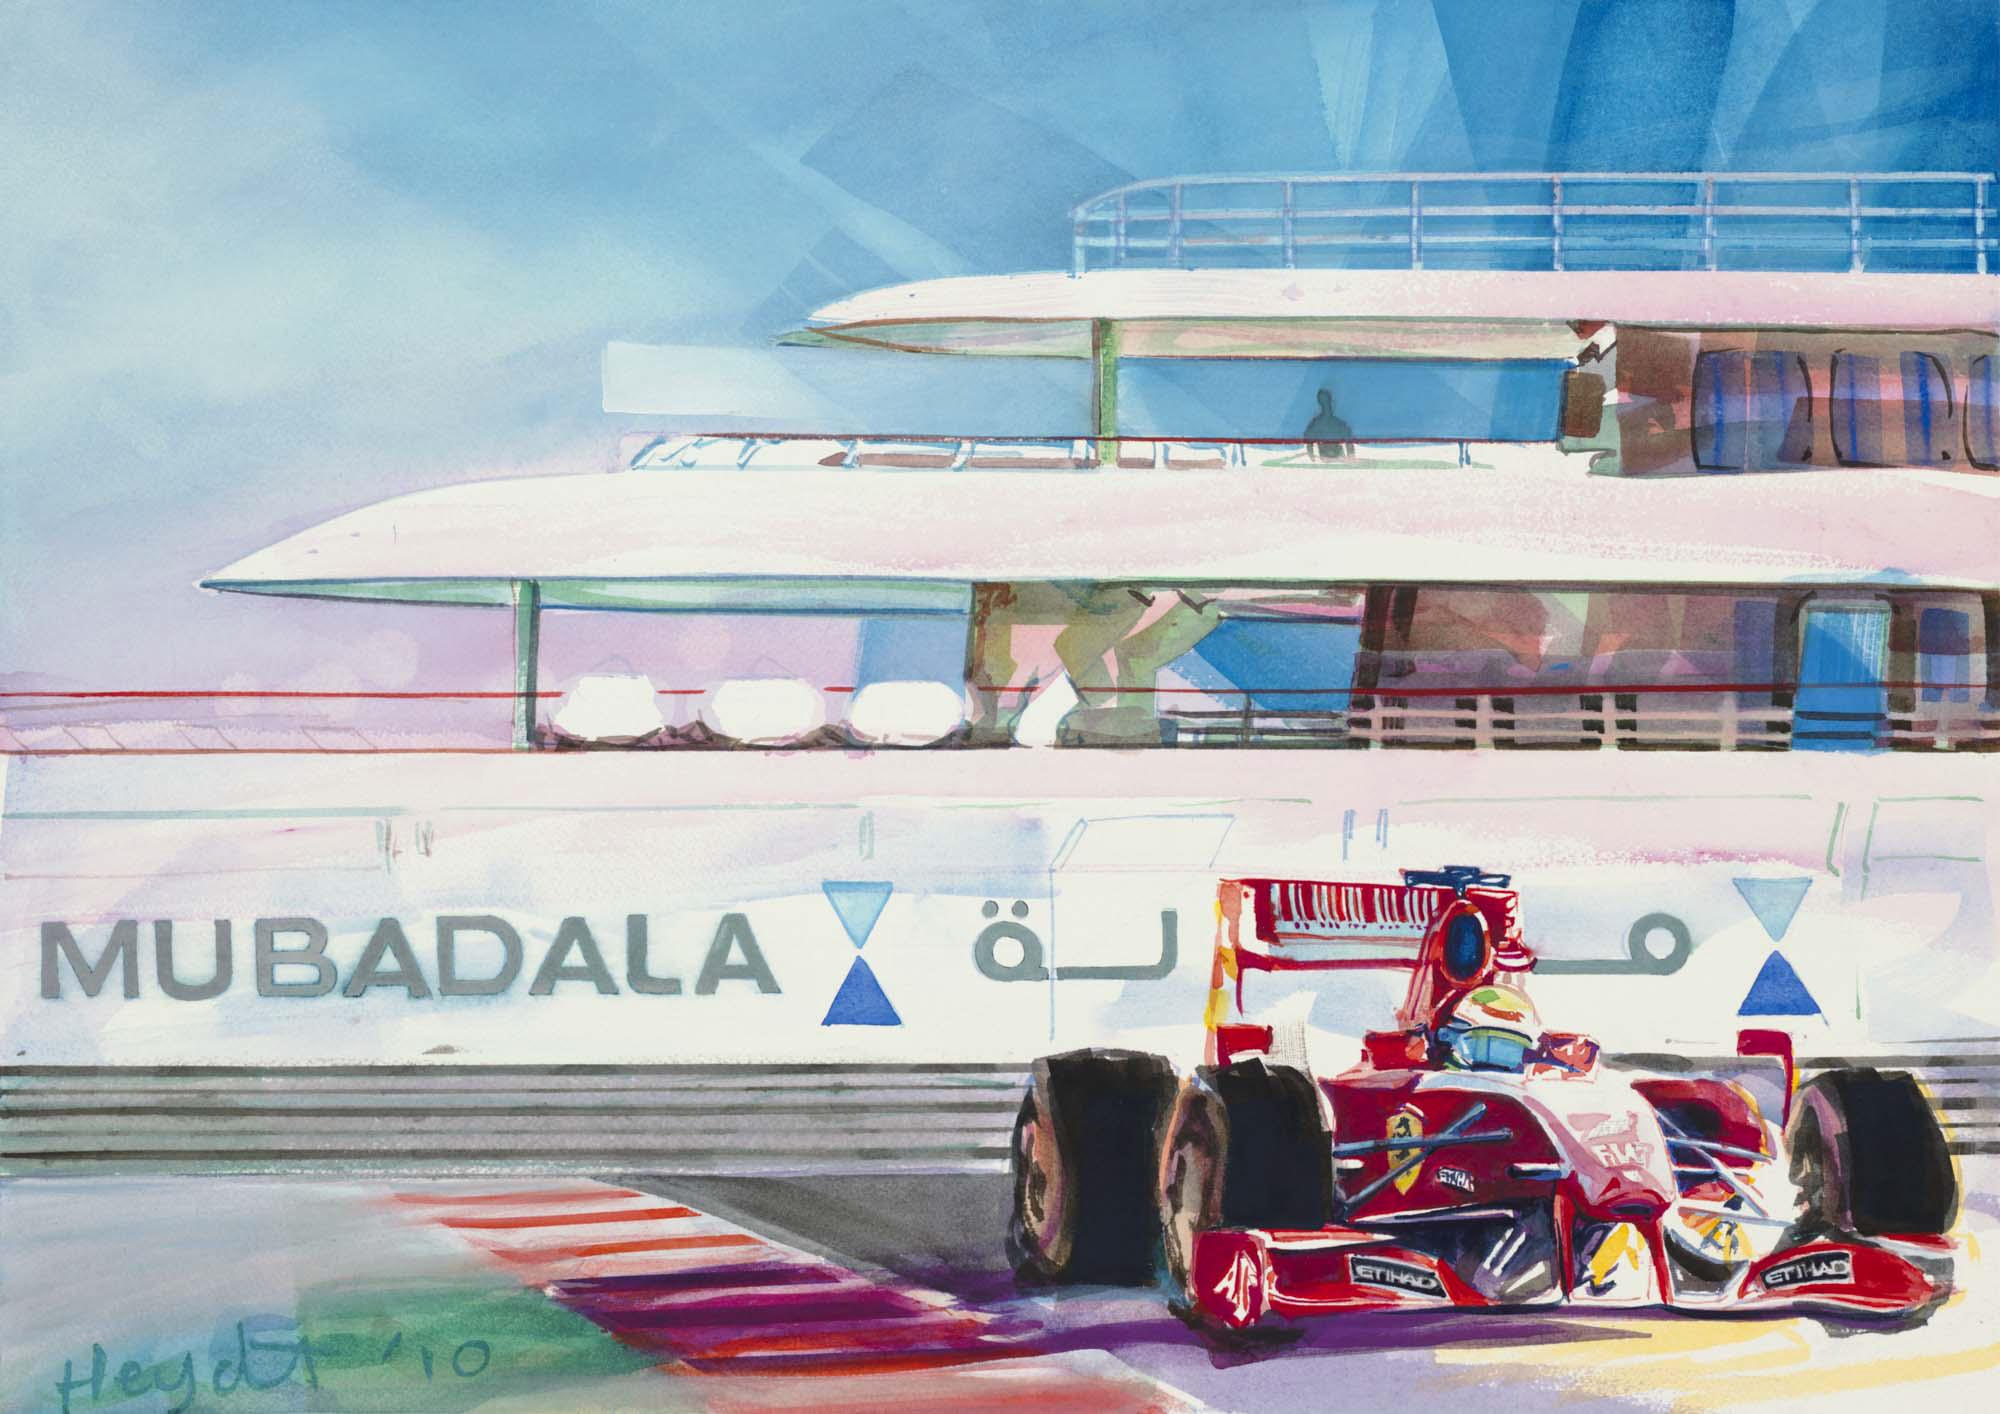 Formula1-wHEYDT-mubadala 2.jpg